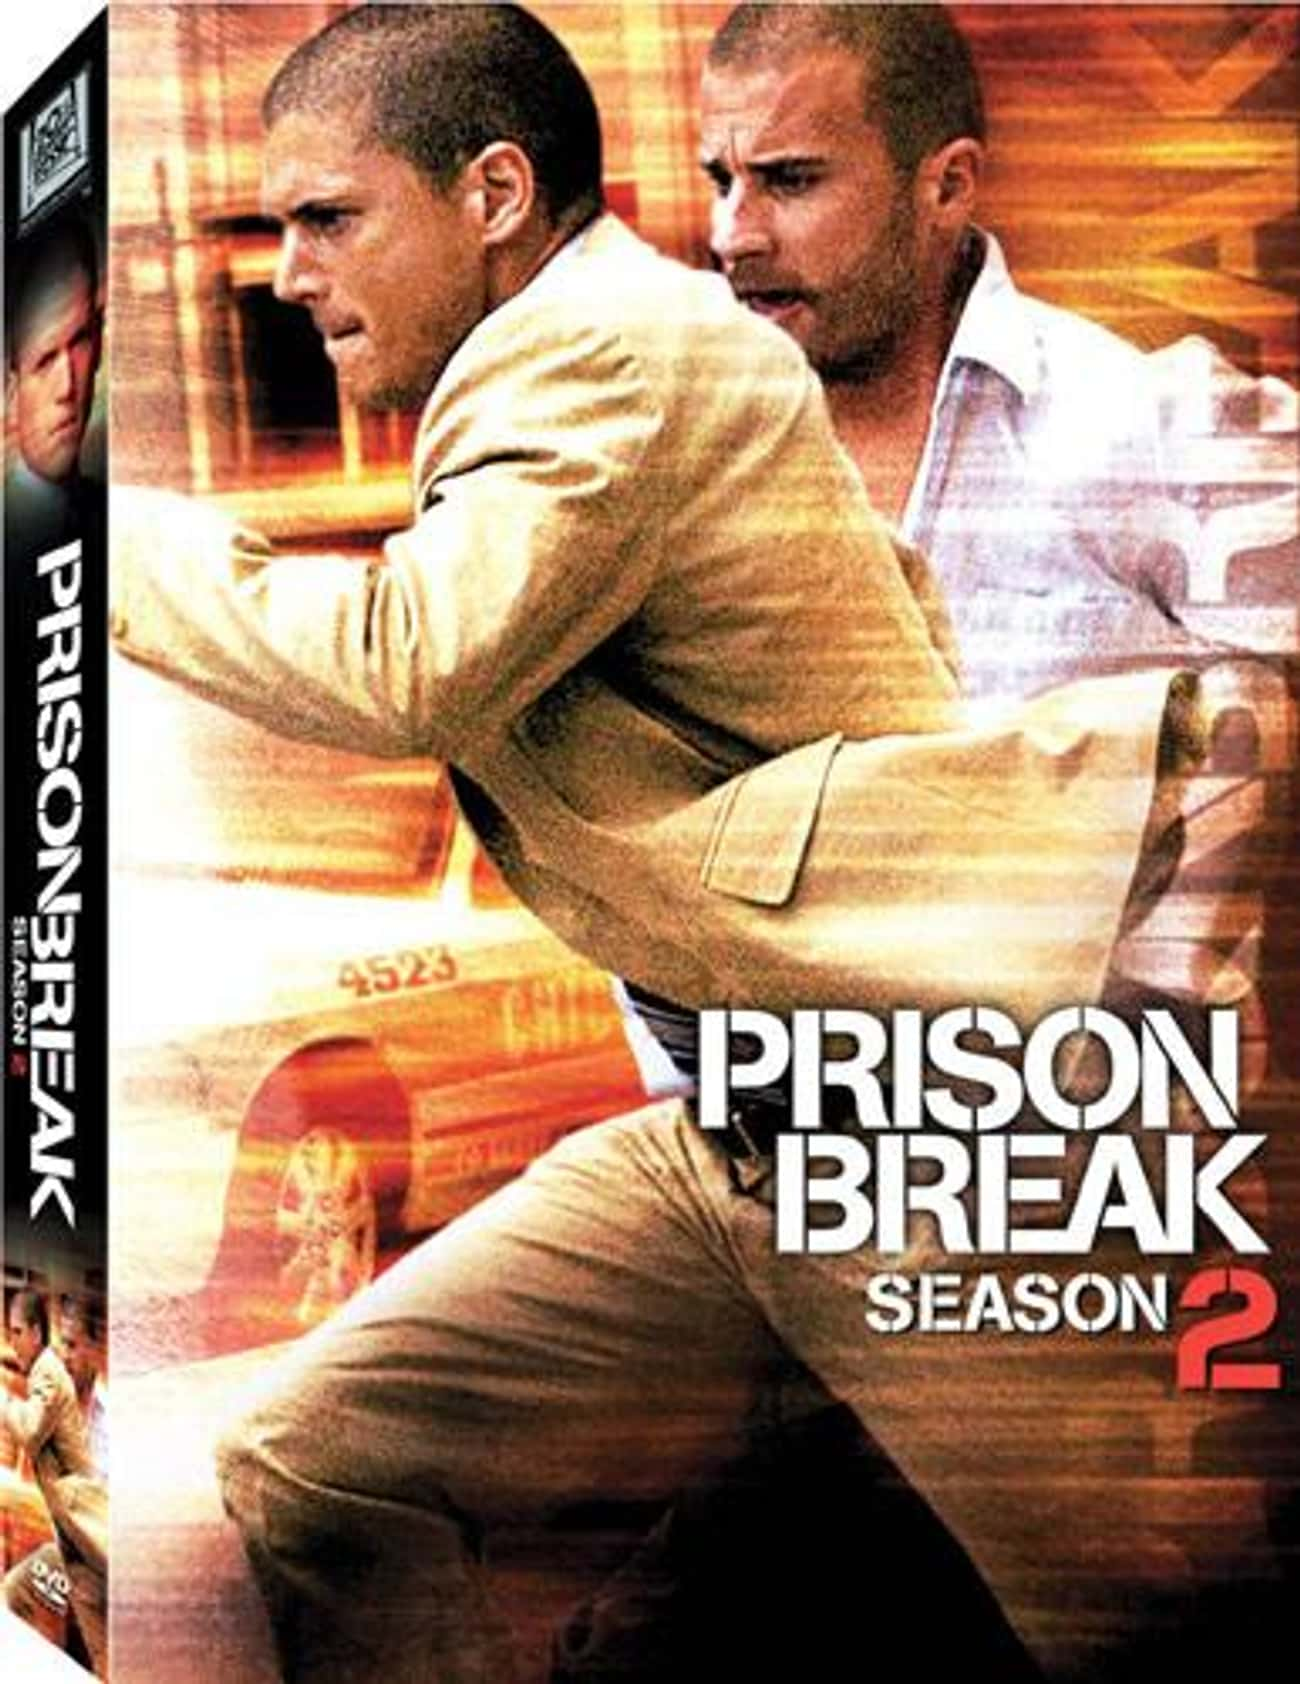 Prison Break - Season 2 is listed (or ranked) 2 on the list The Best Seasons of Prison Break